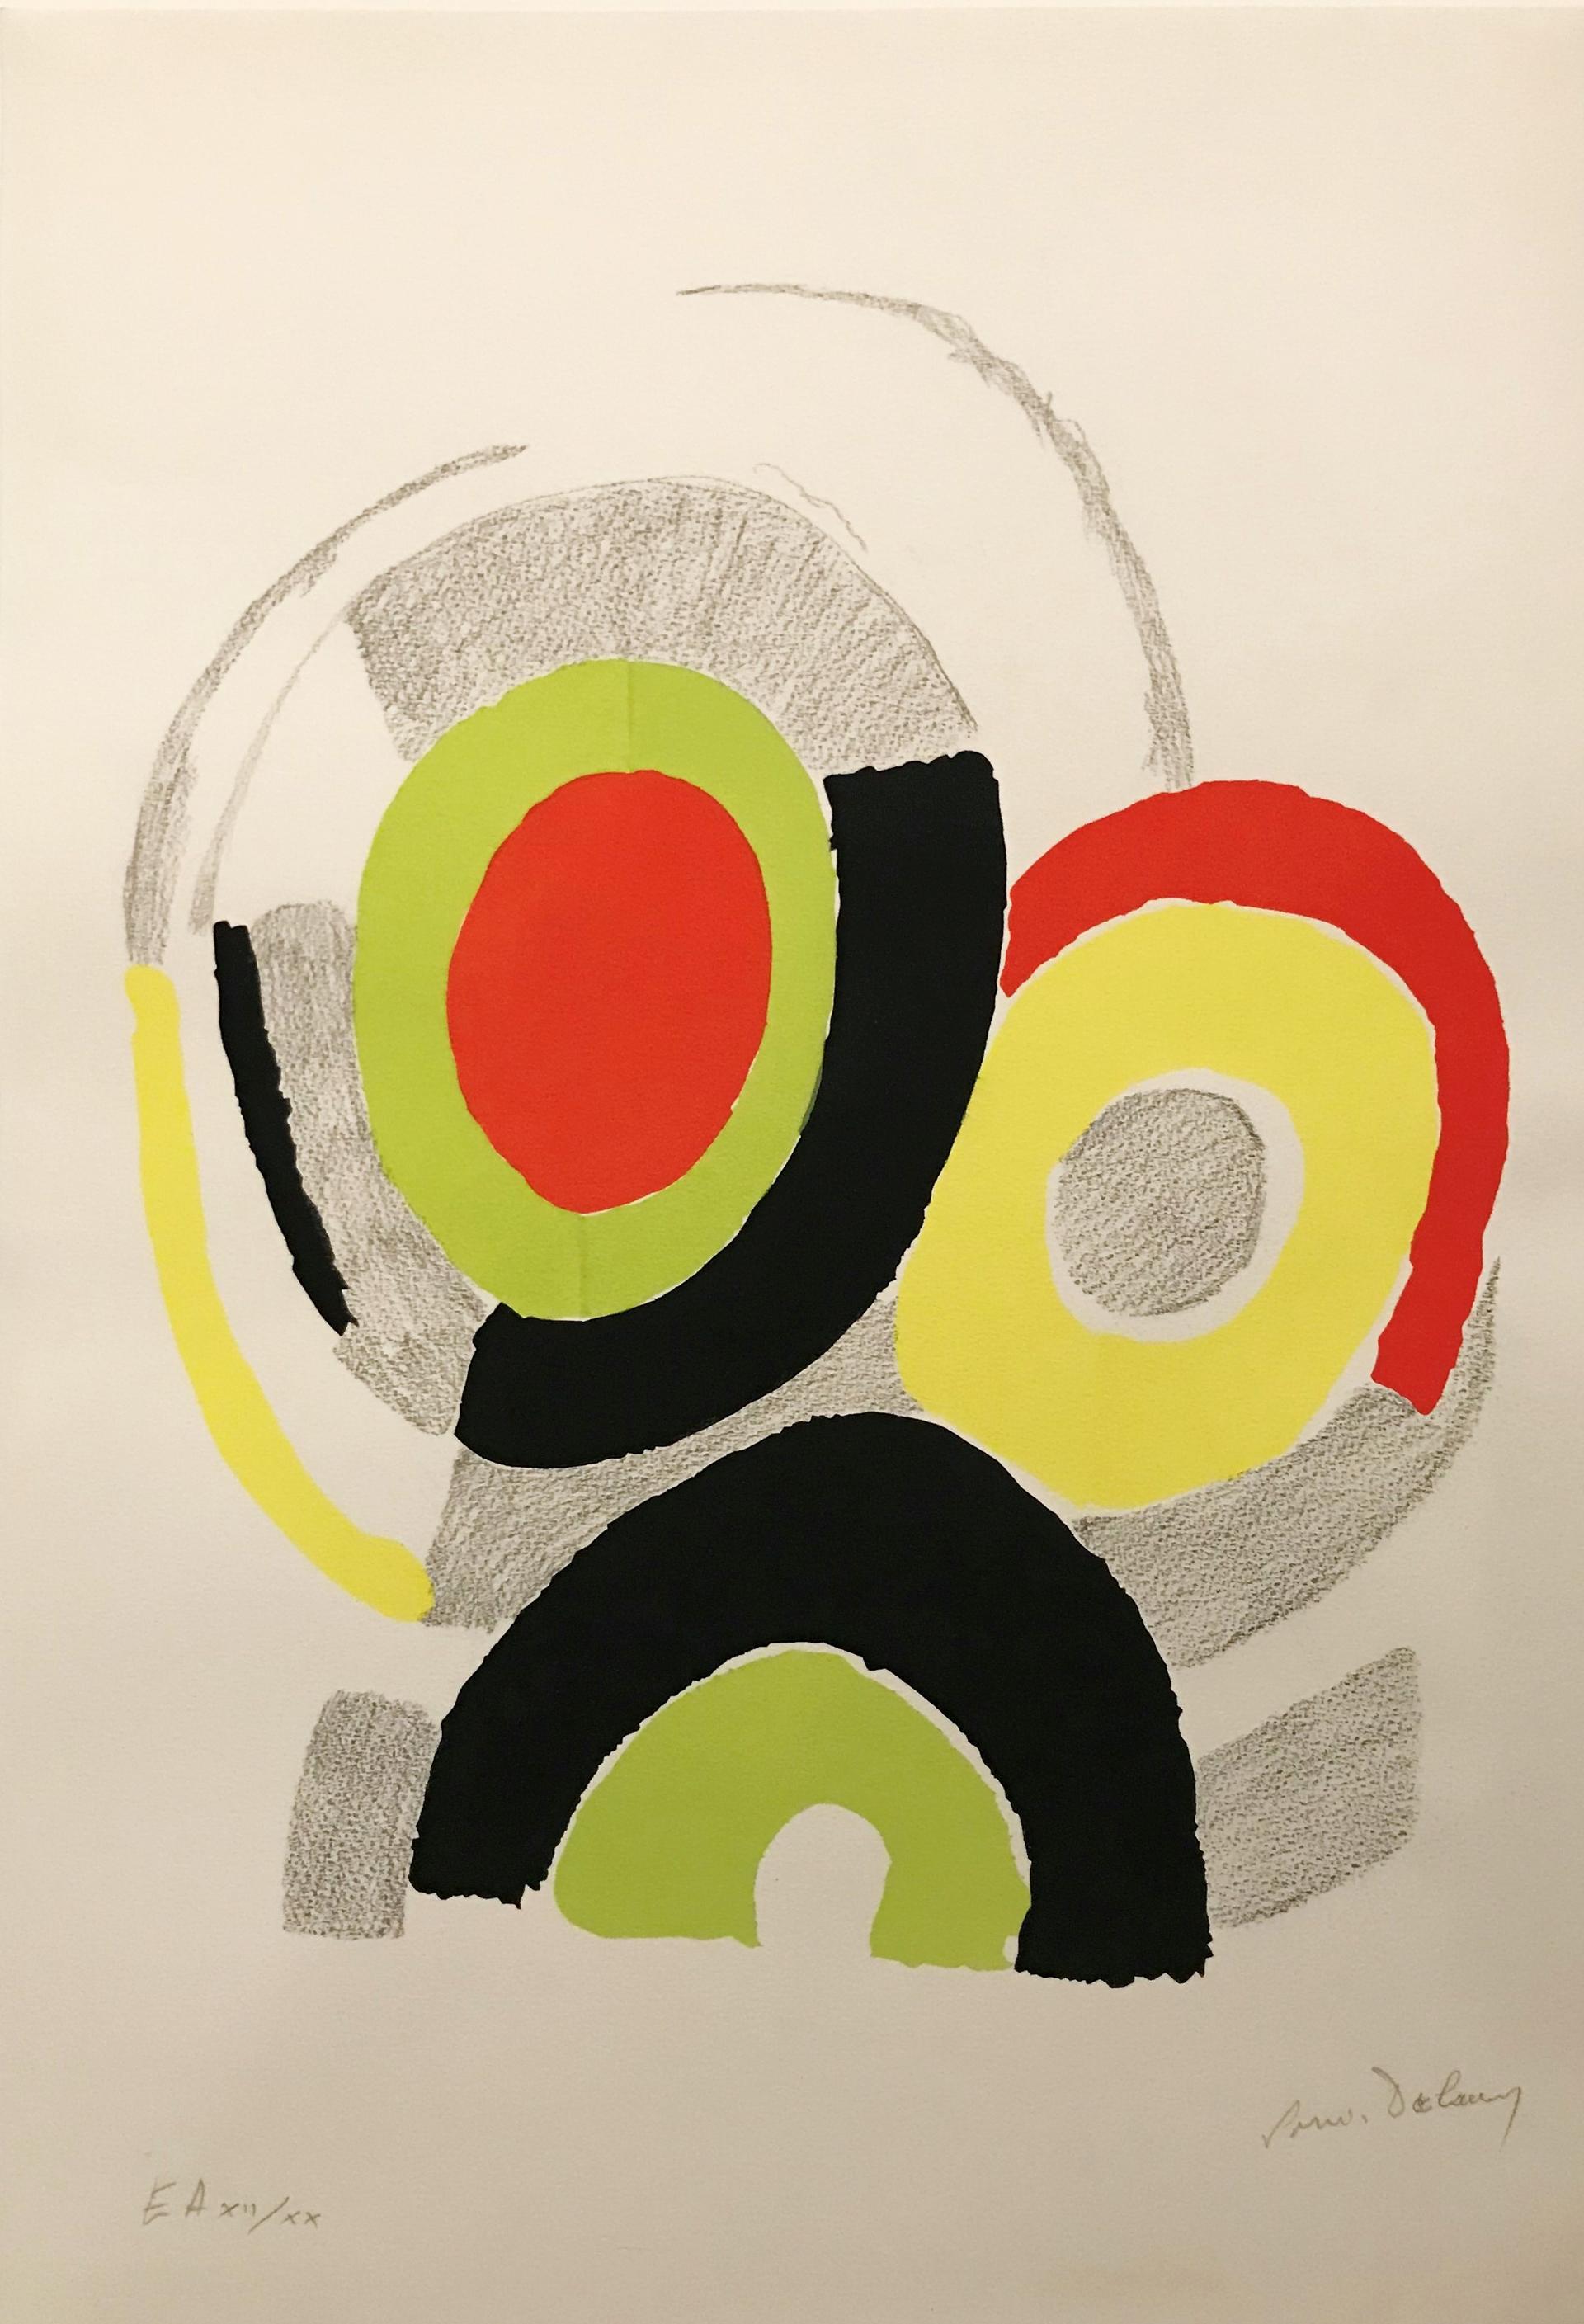 Trio from Les Illuminations de Rimbaud by Sonia Delaunay